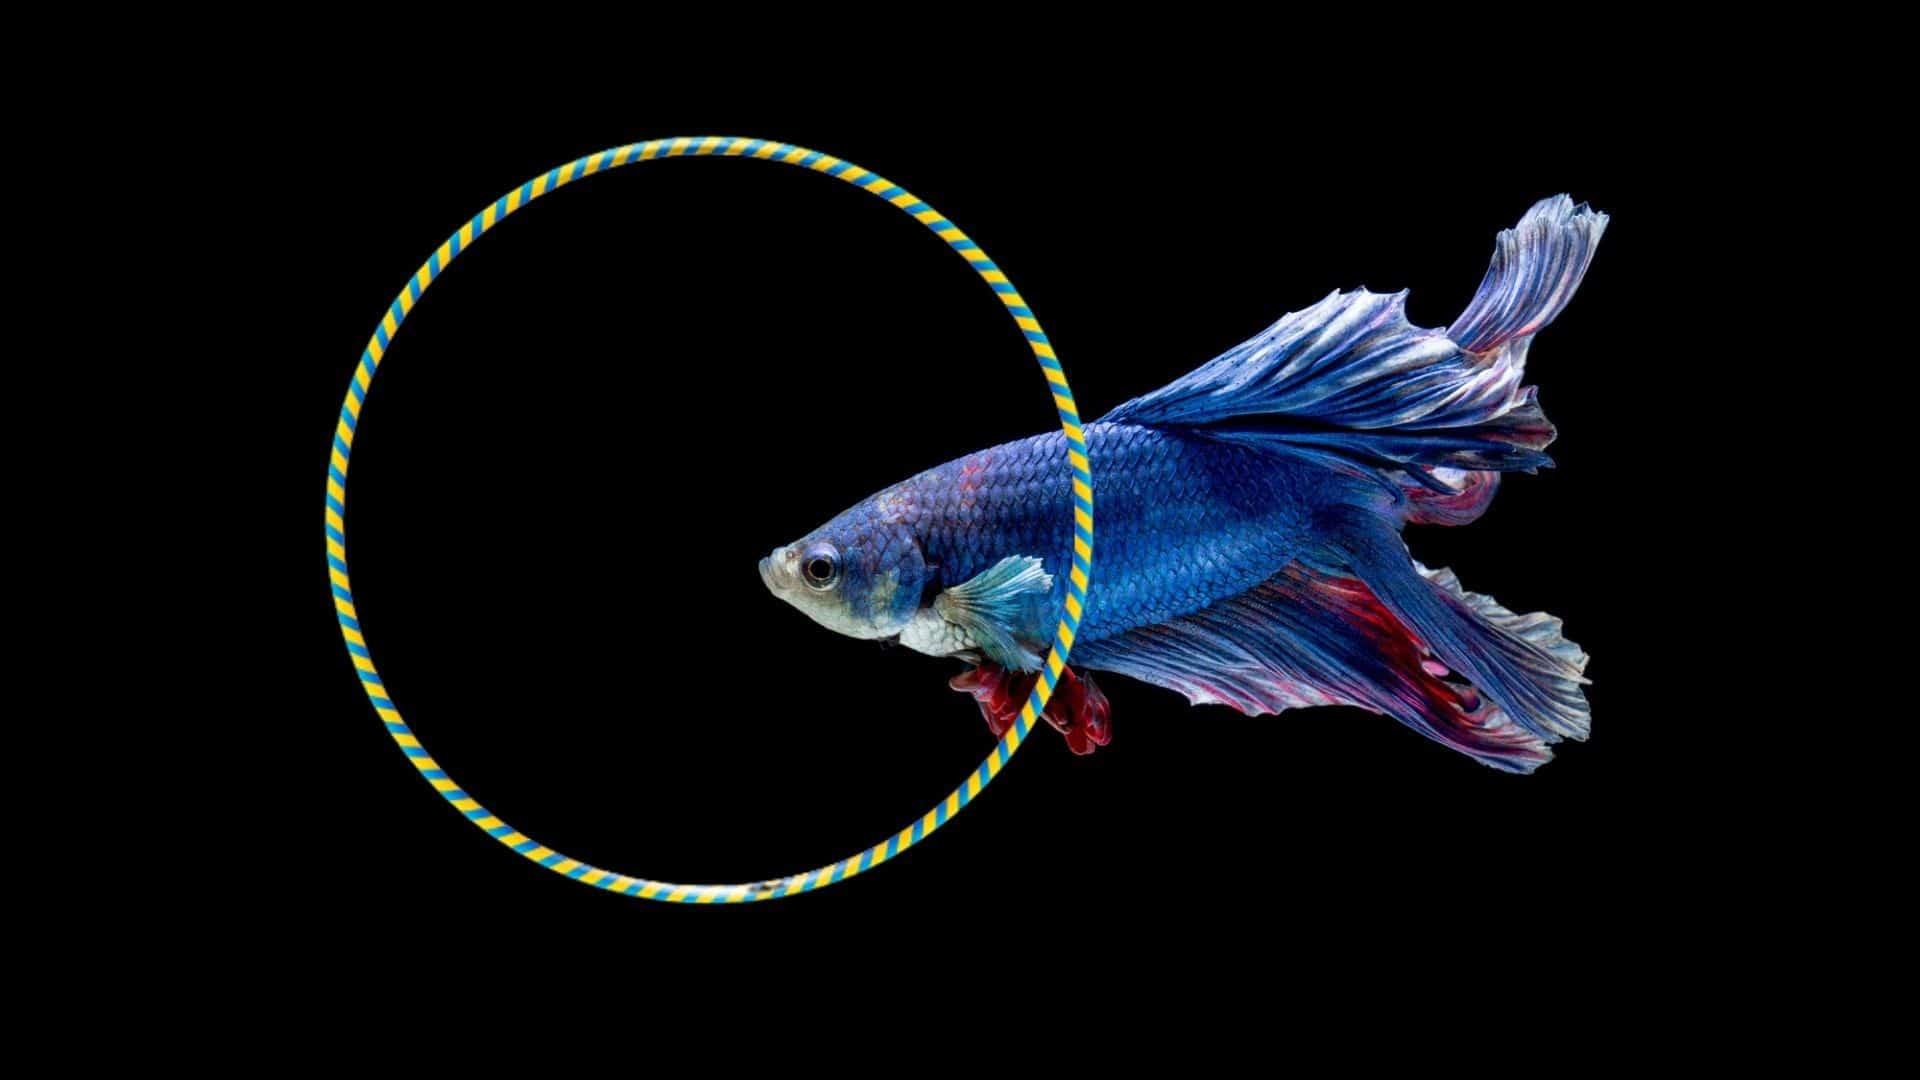 betta fish playing in hoop